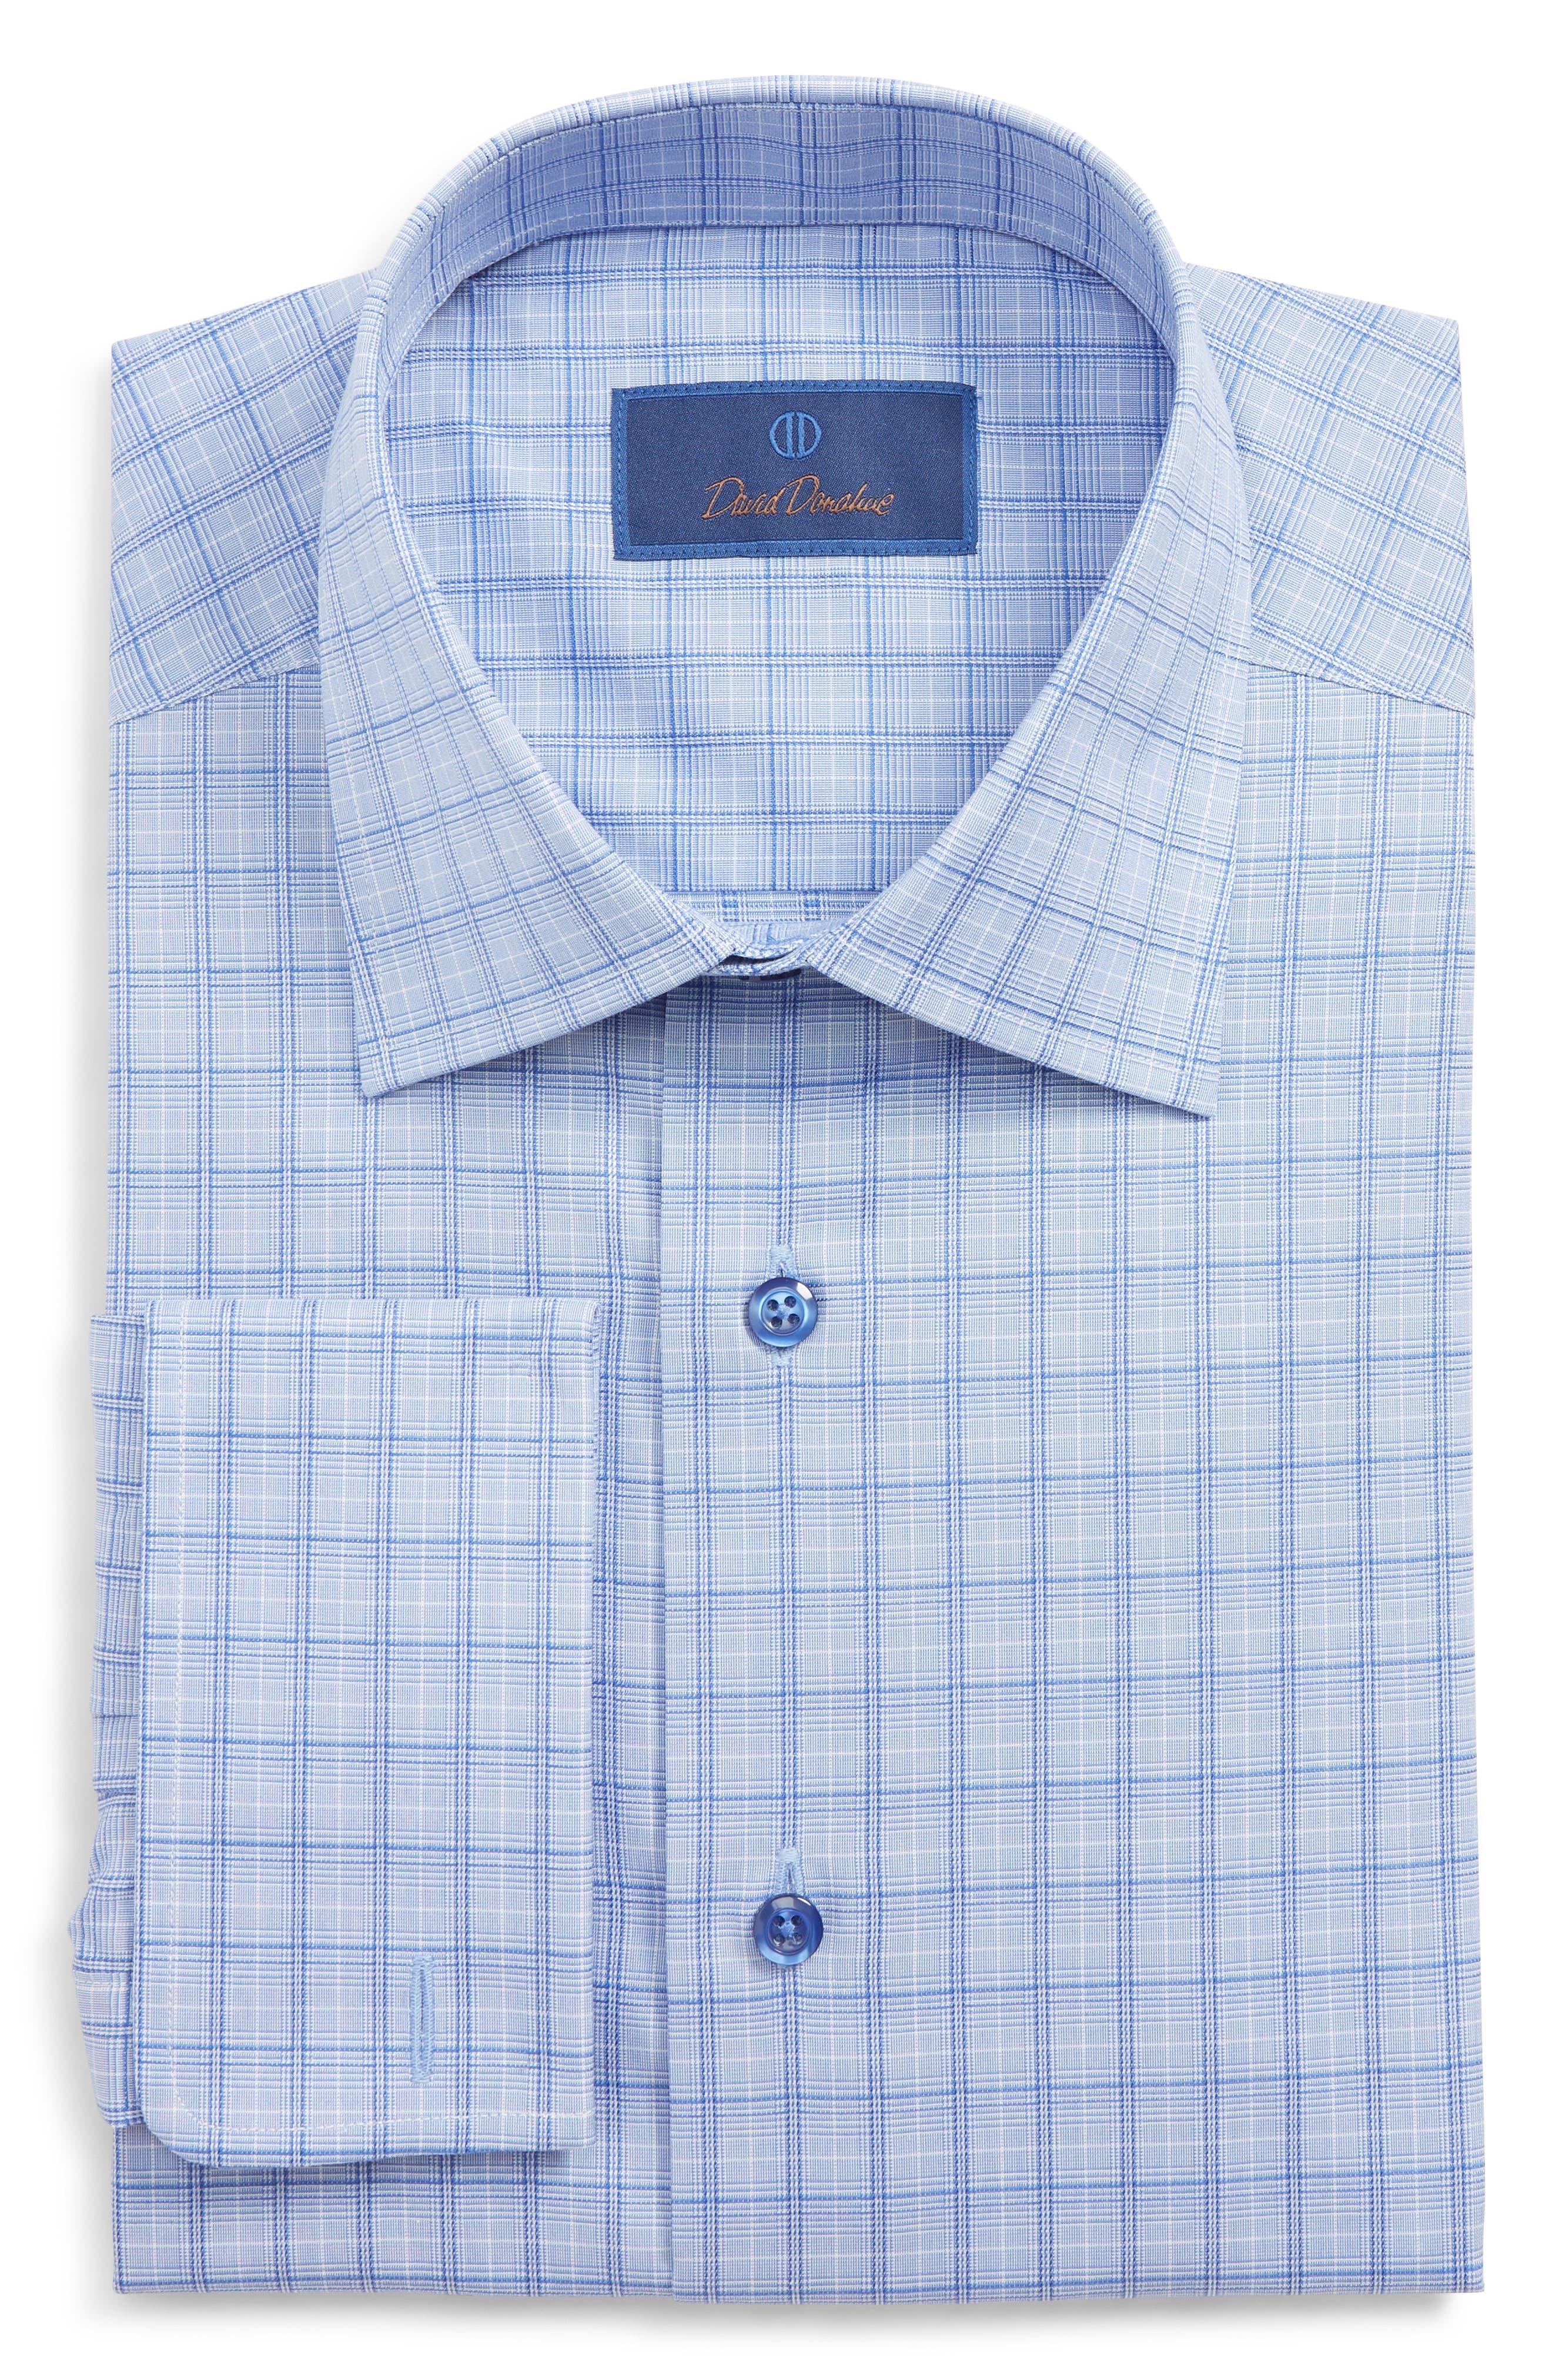 DAVID DONAHUE Regular Fit Plaid Dress Shirt, Main, color, BLUE/ NAVY